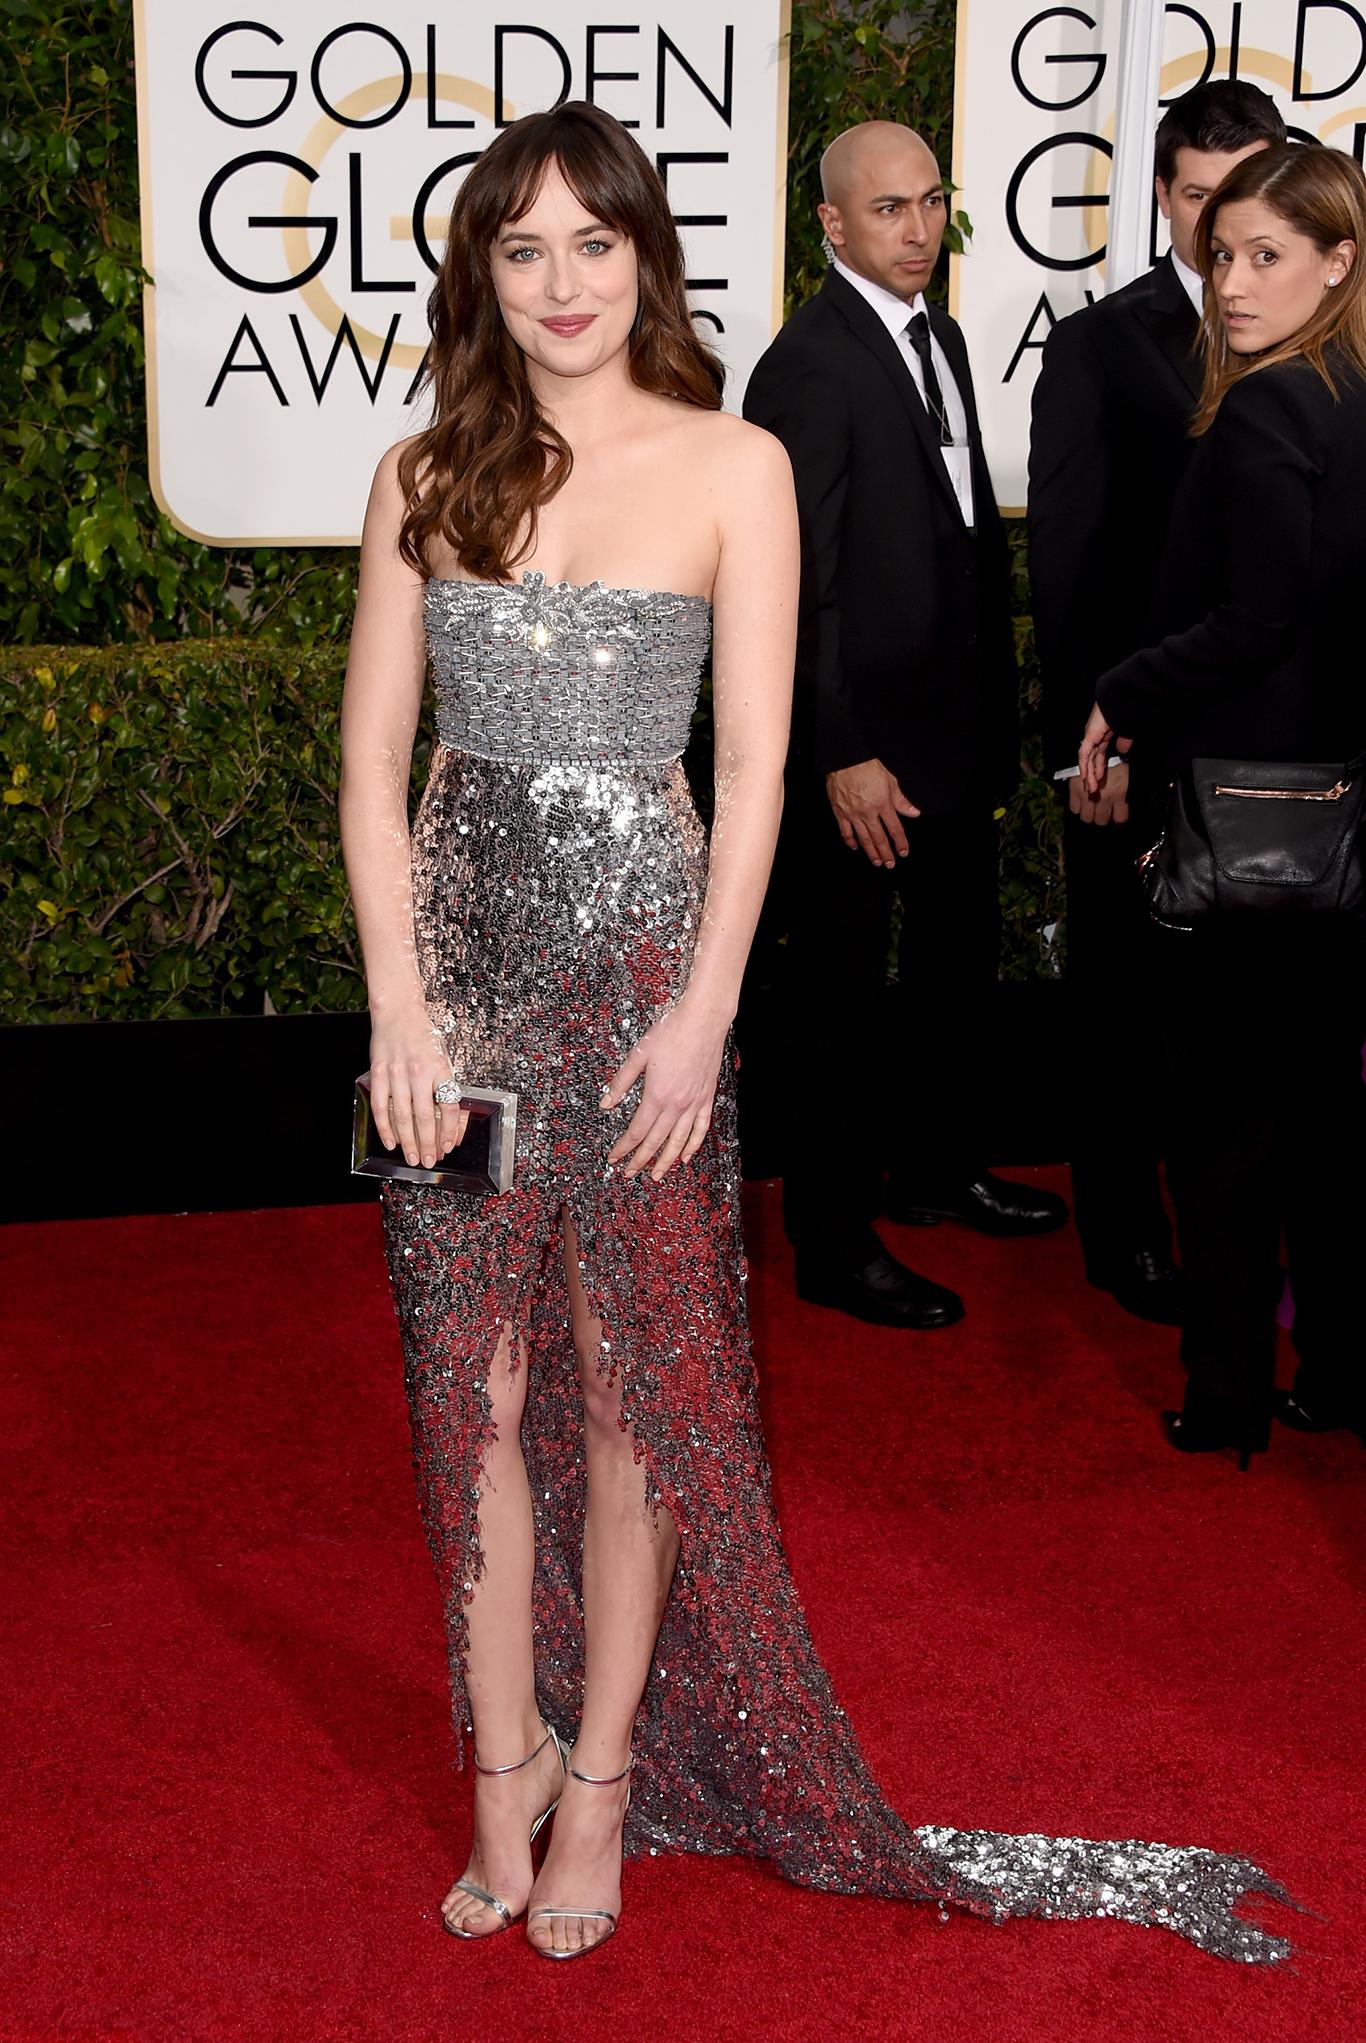 Golden Globe Red Carpet Recap 2015 - JK Style